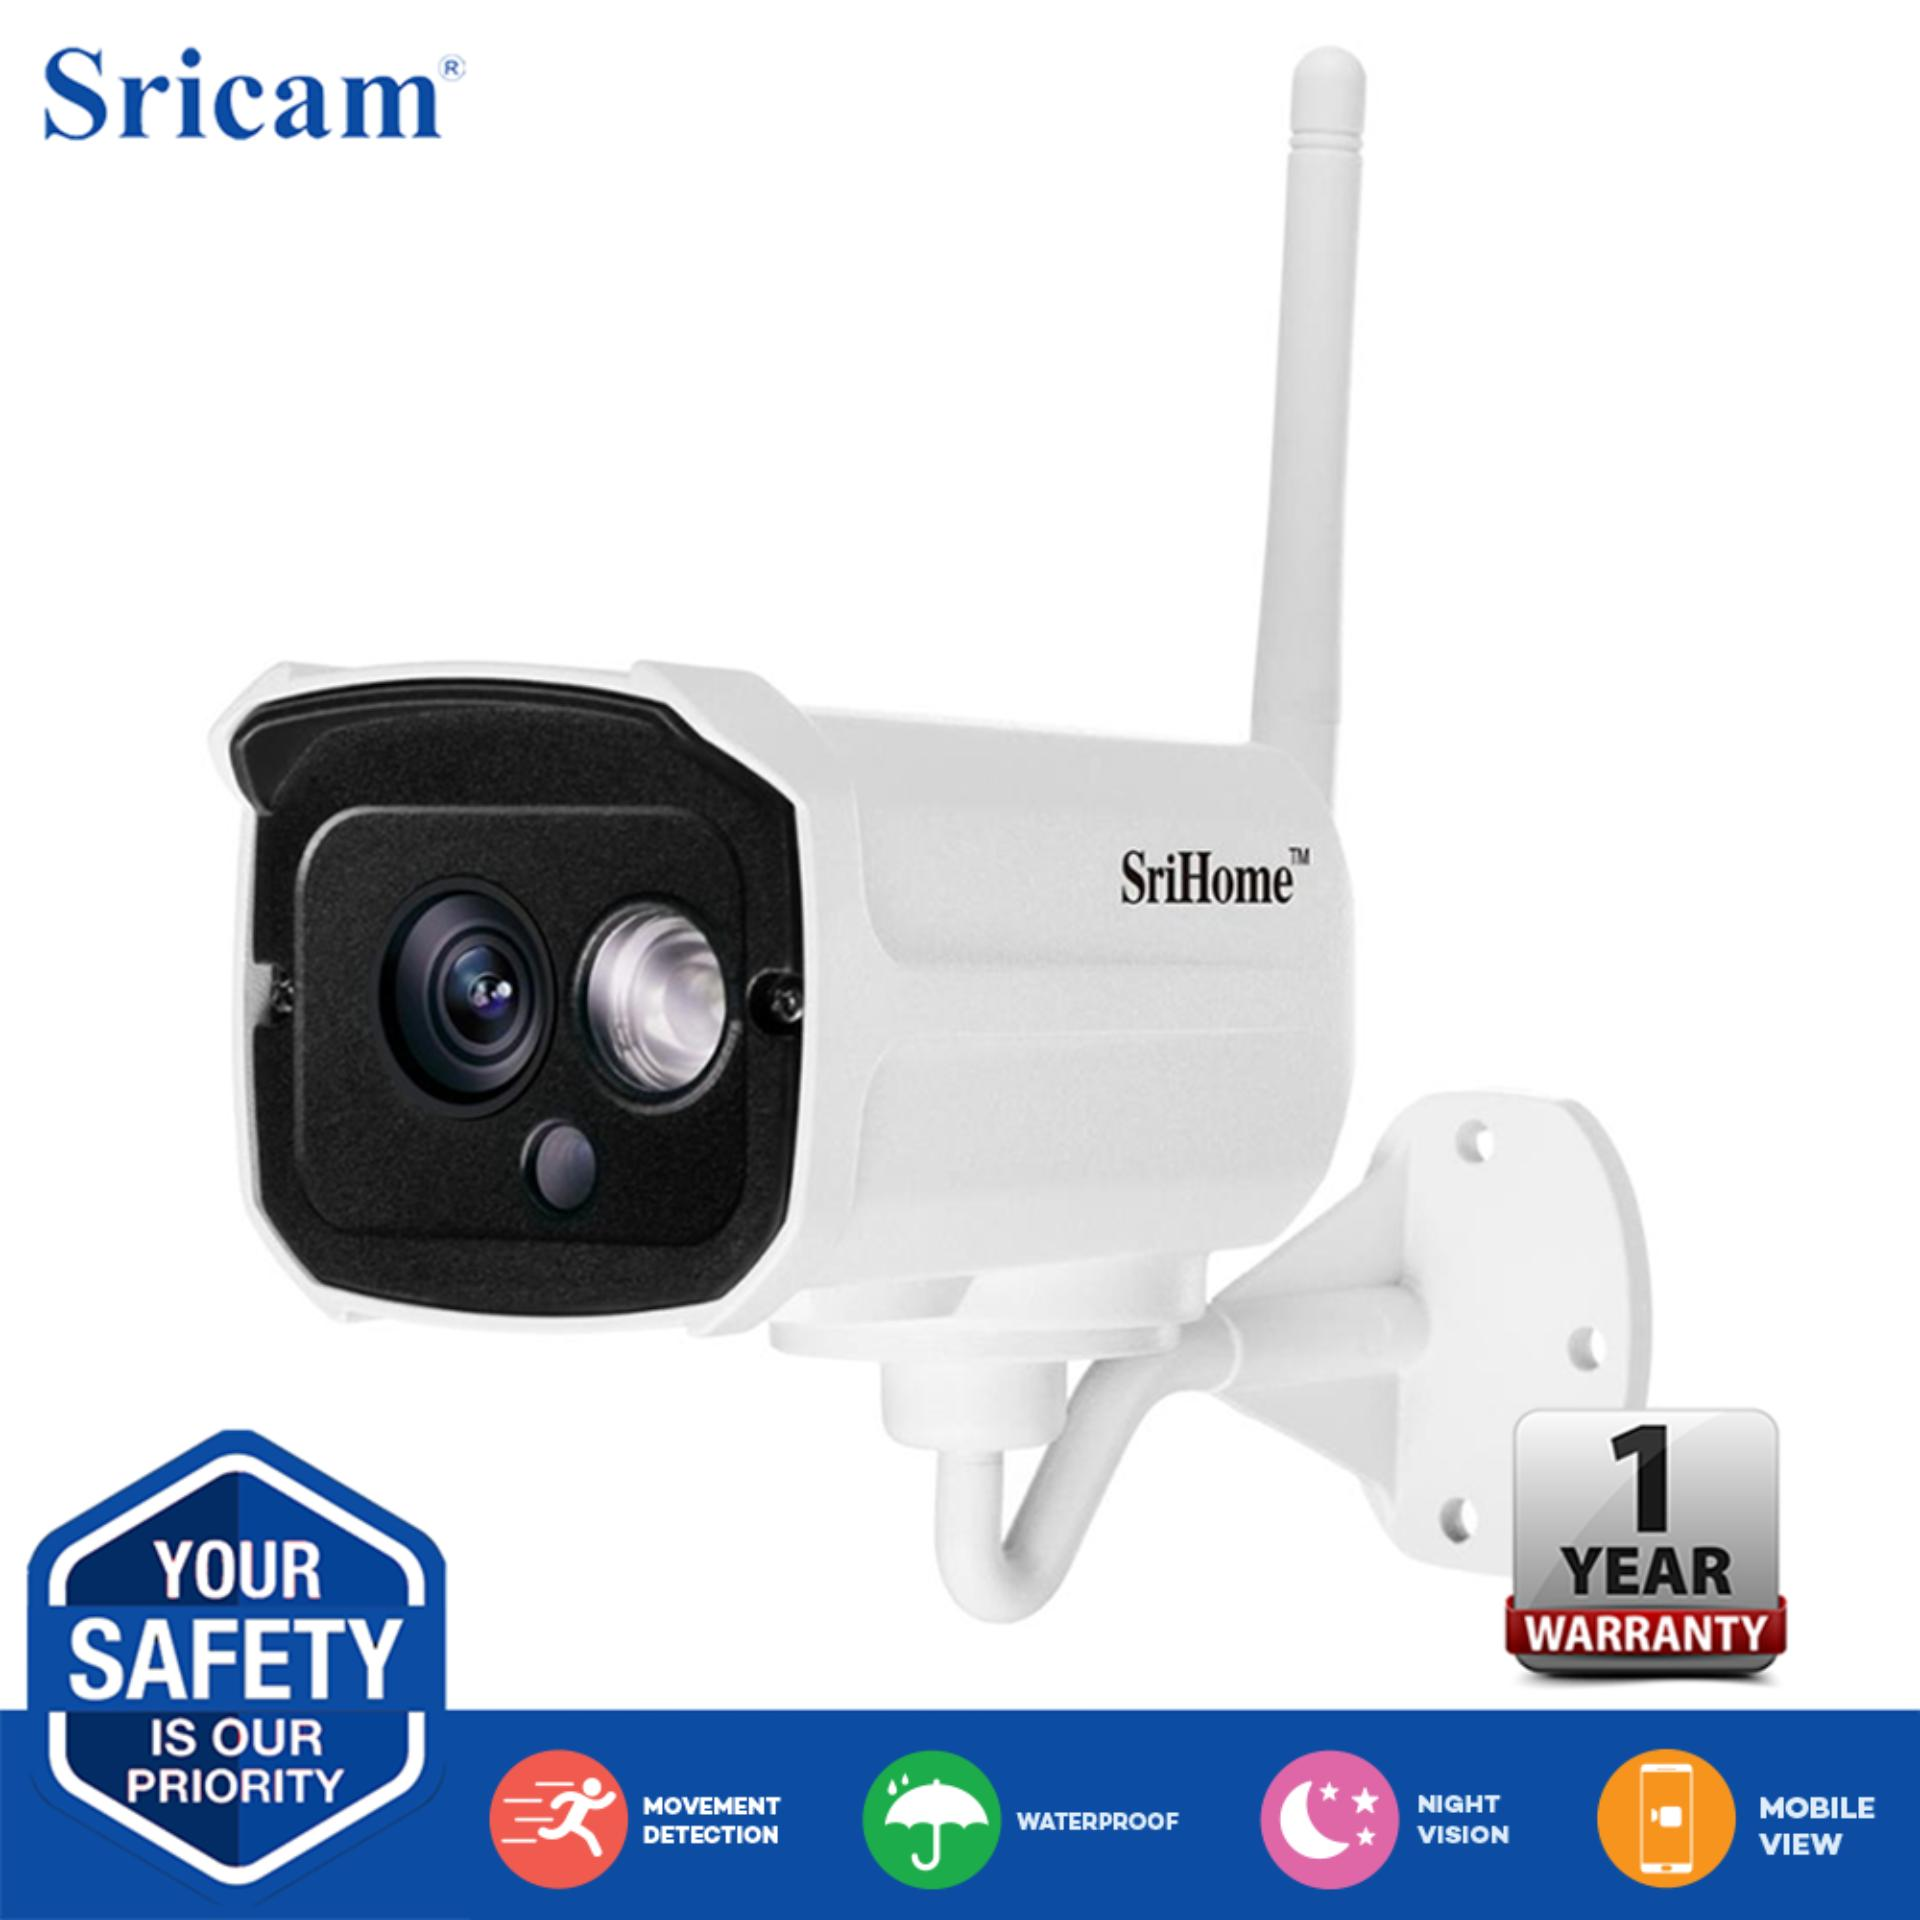 Sricam SH024 Wifi CCTV H.264 1080P 2MP Night Vision Onvif Waterproof Outdoor IP Camera